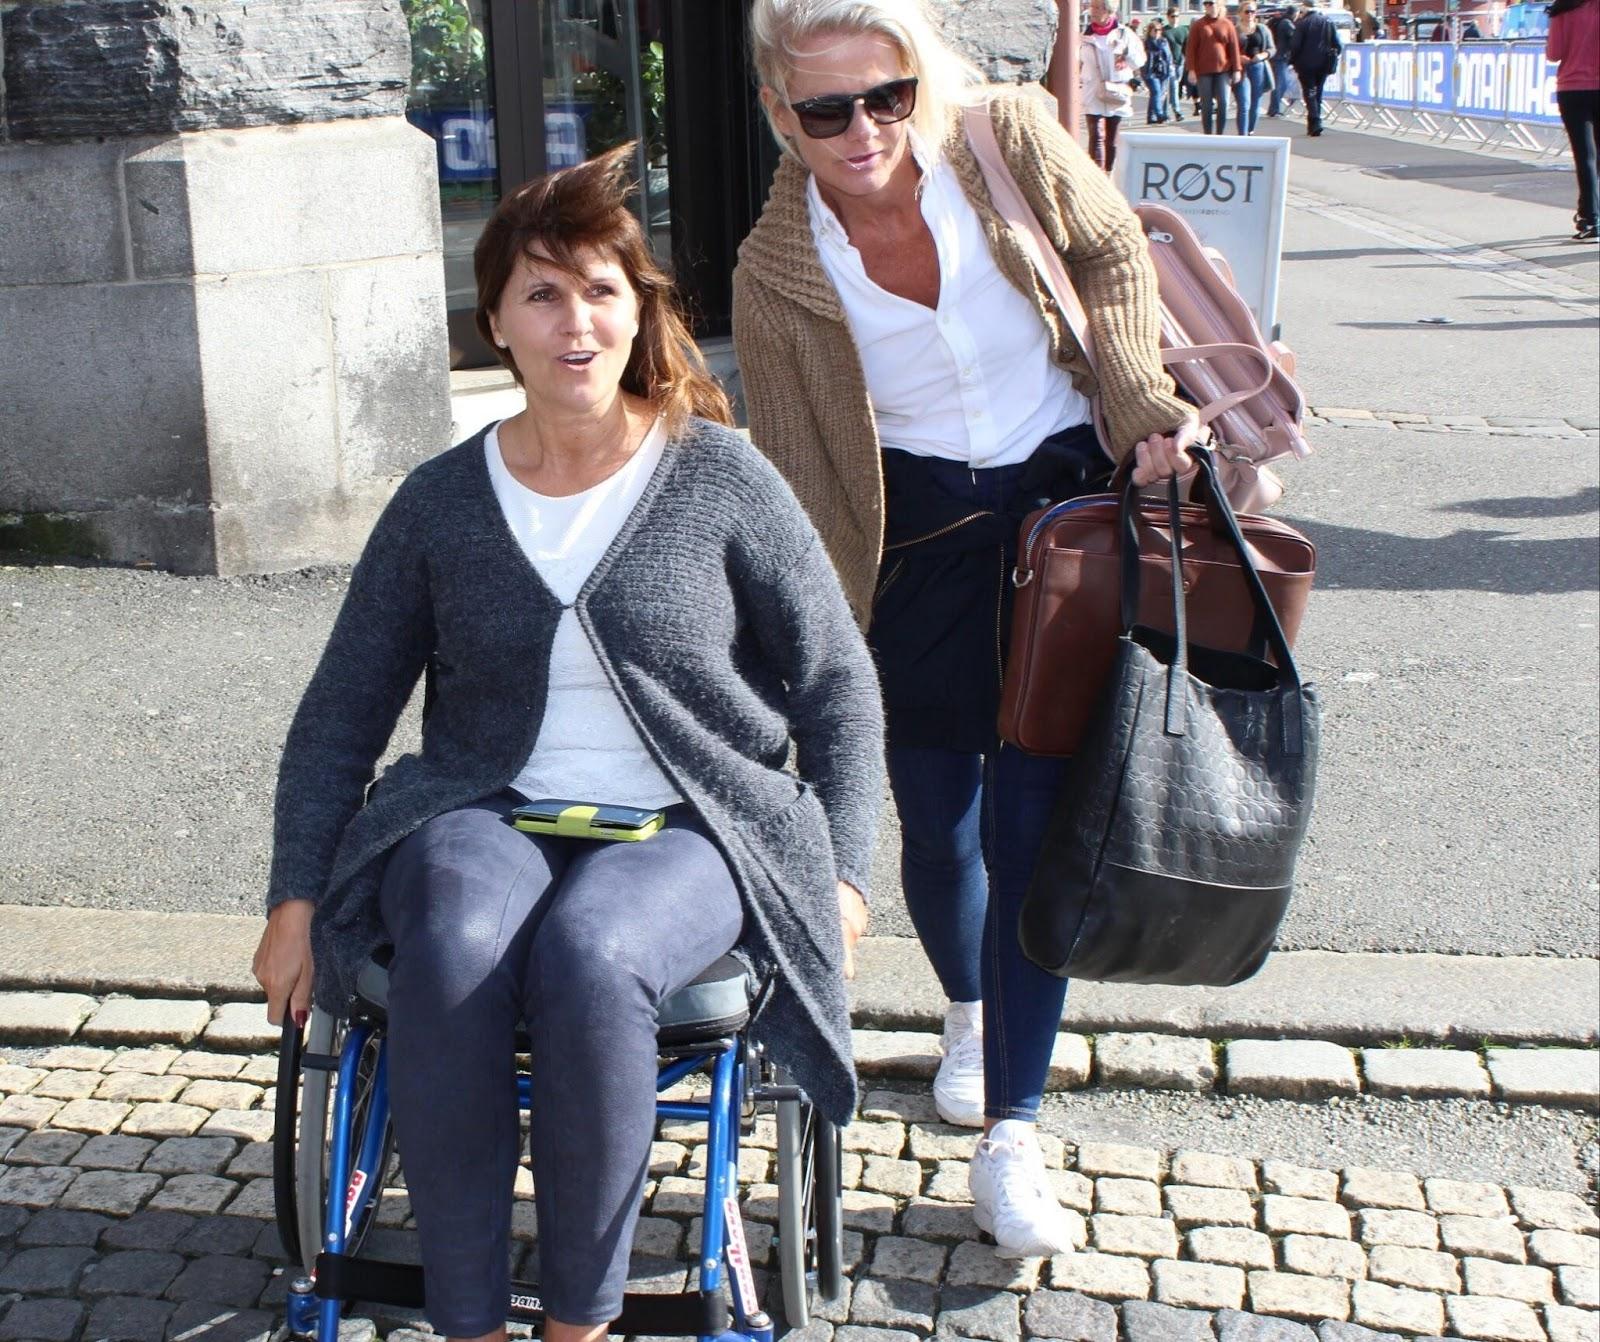 Bilde av Bergens varaordfører Marita Moltu sittende i rullestol sammen med en assistent fra Prima Assistanse.